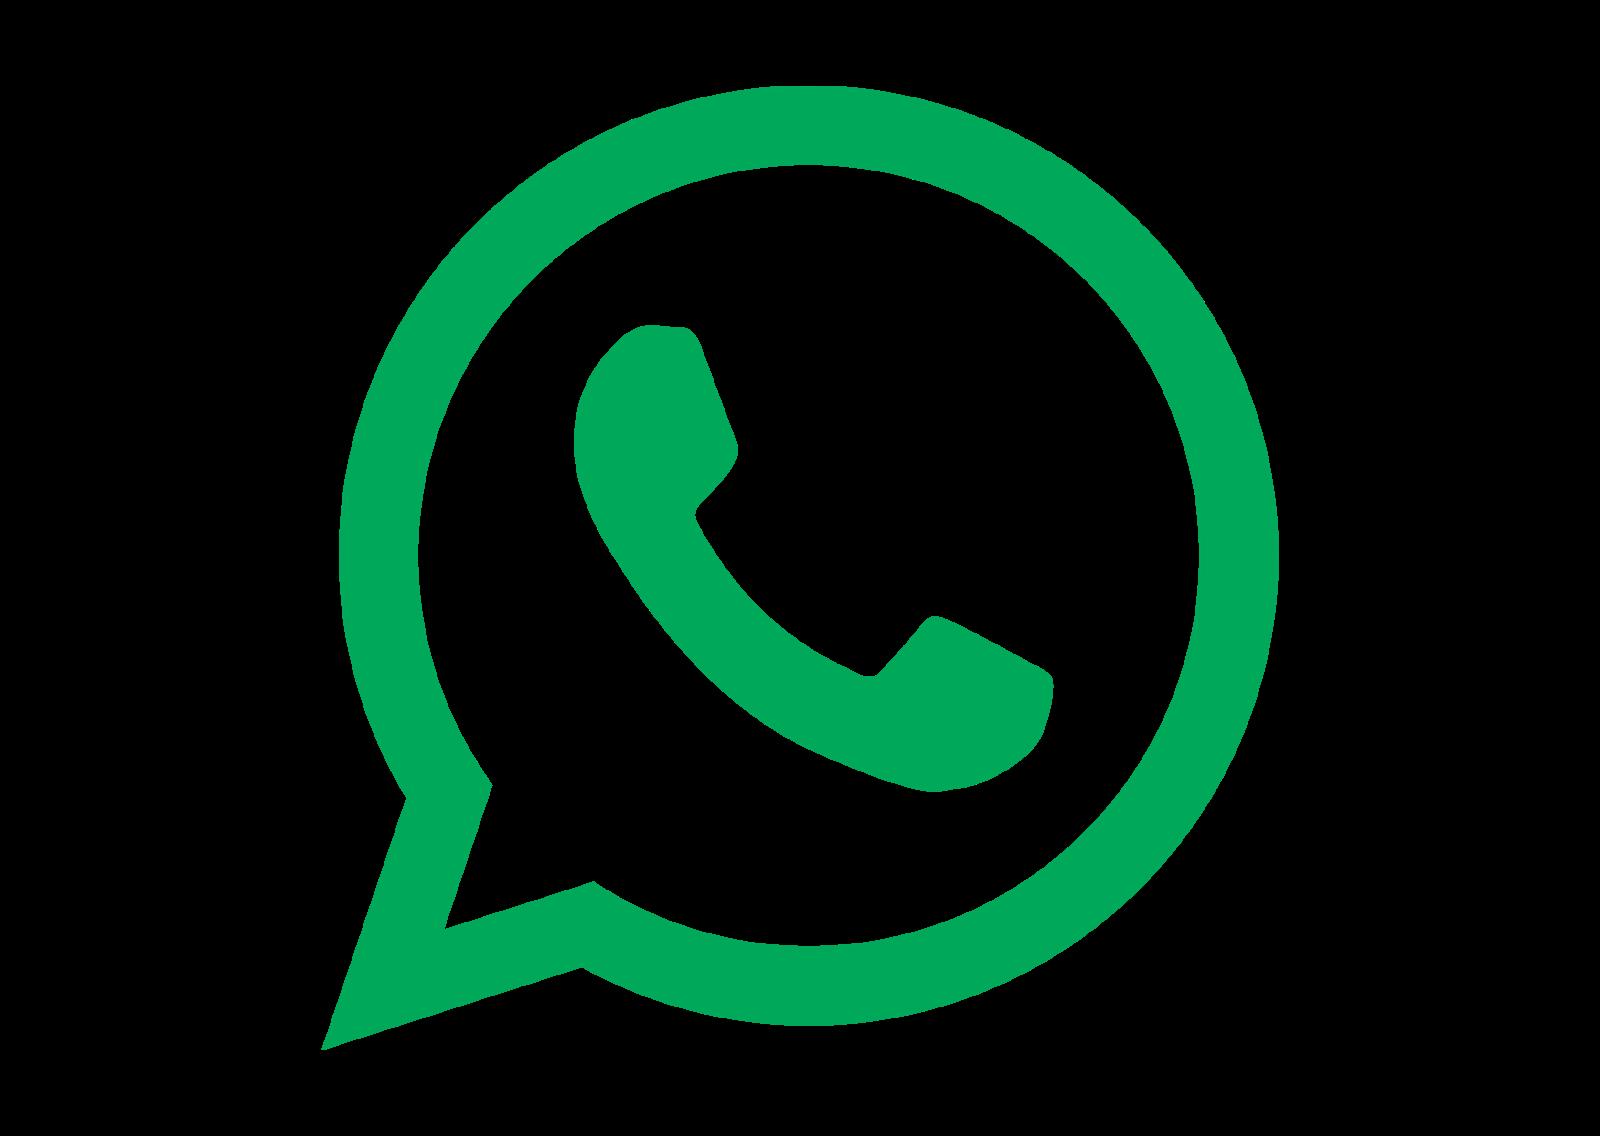 Whatsapp Logo PNG - 175543